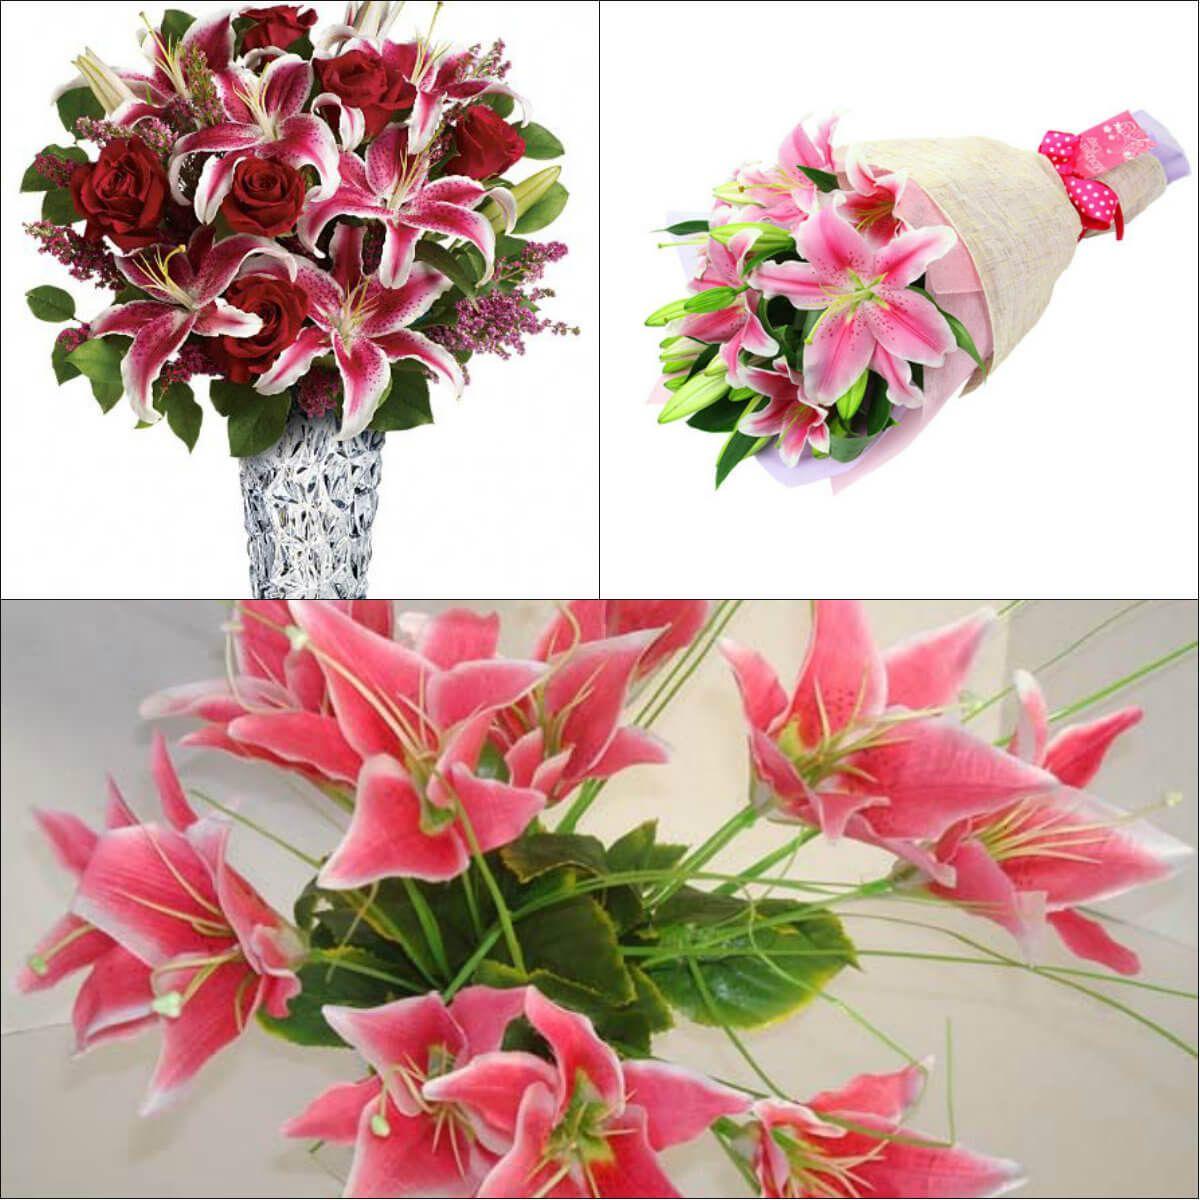 Lily flower bouquet | Flower Ideas | Pinterest | Beautiful flowers ...